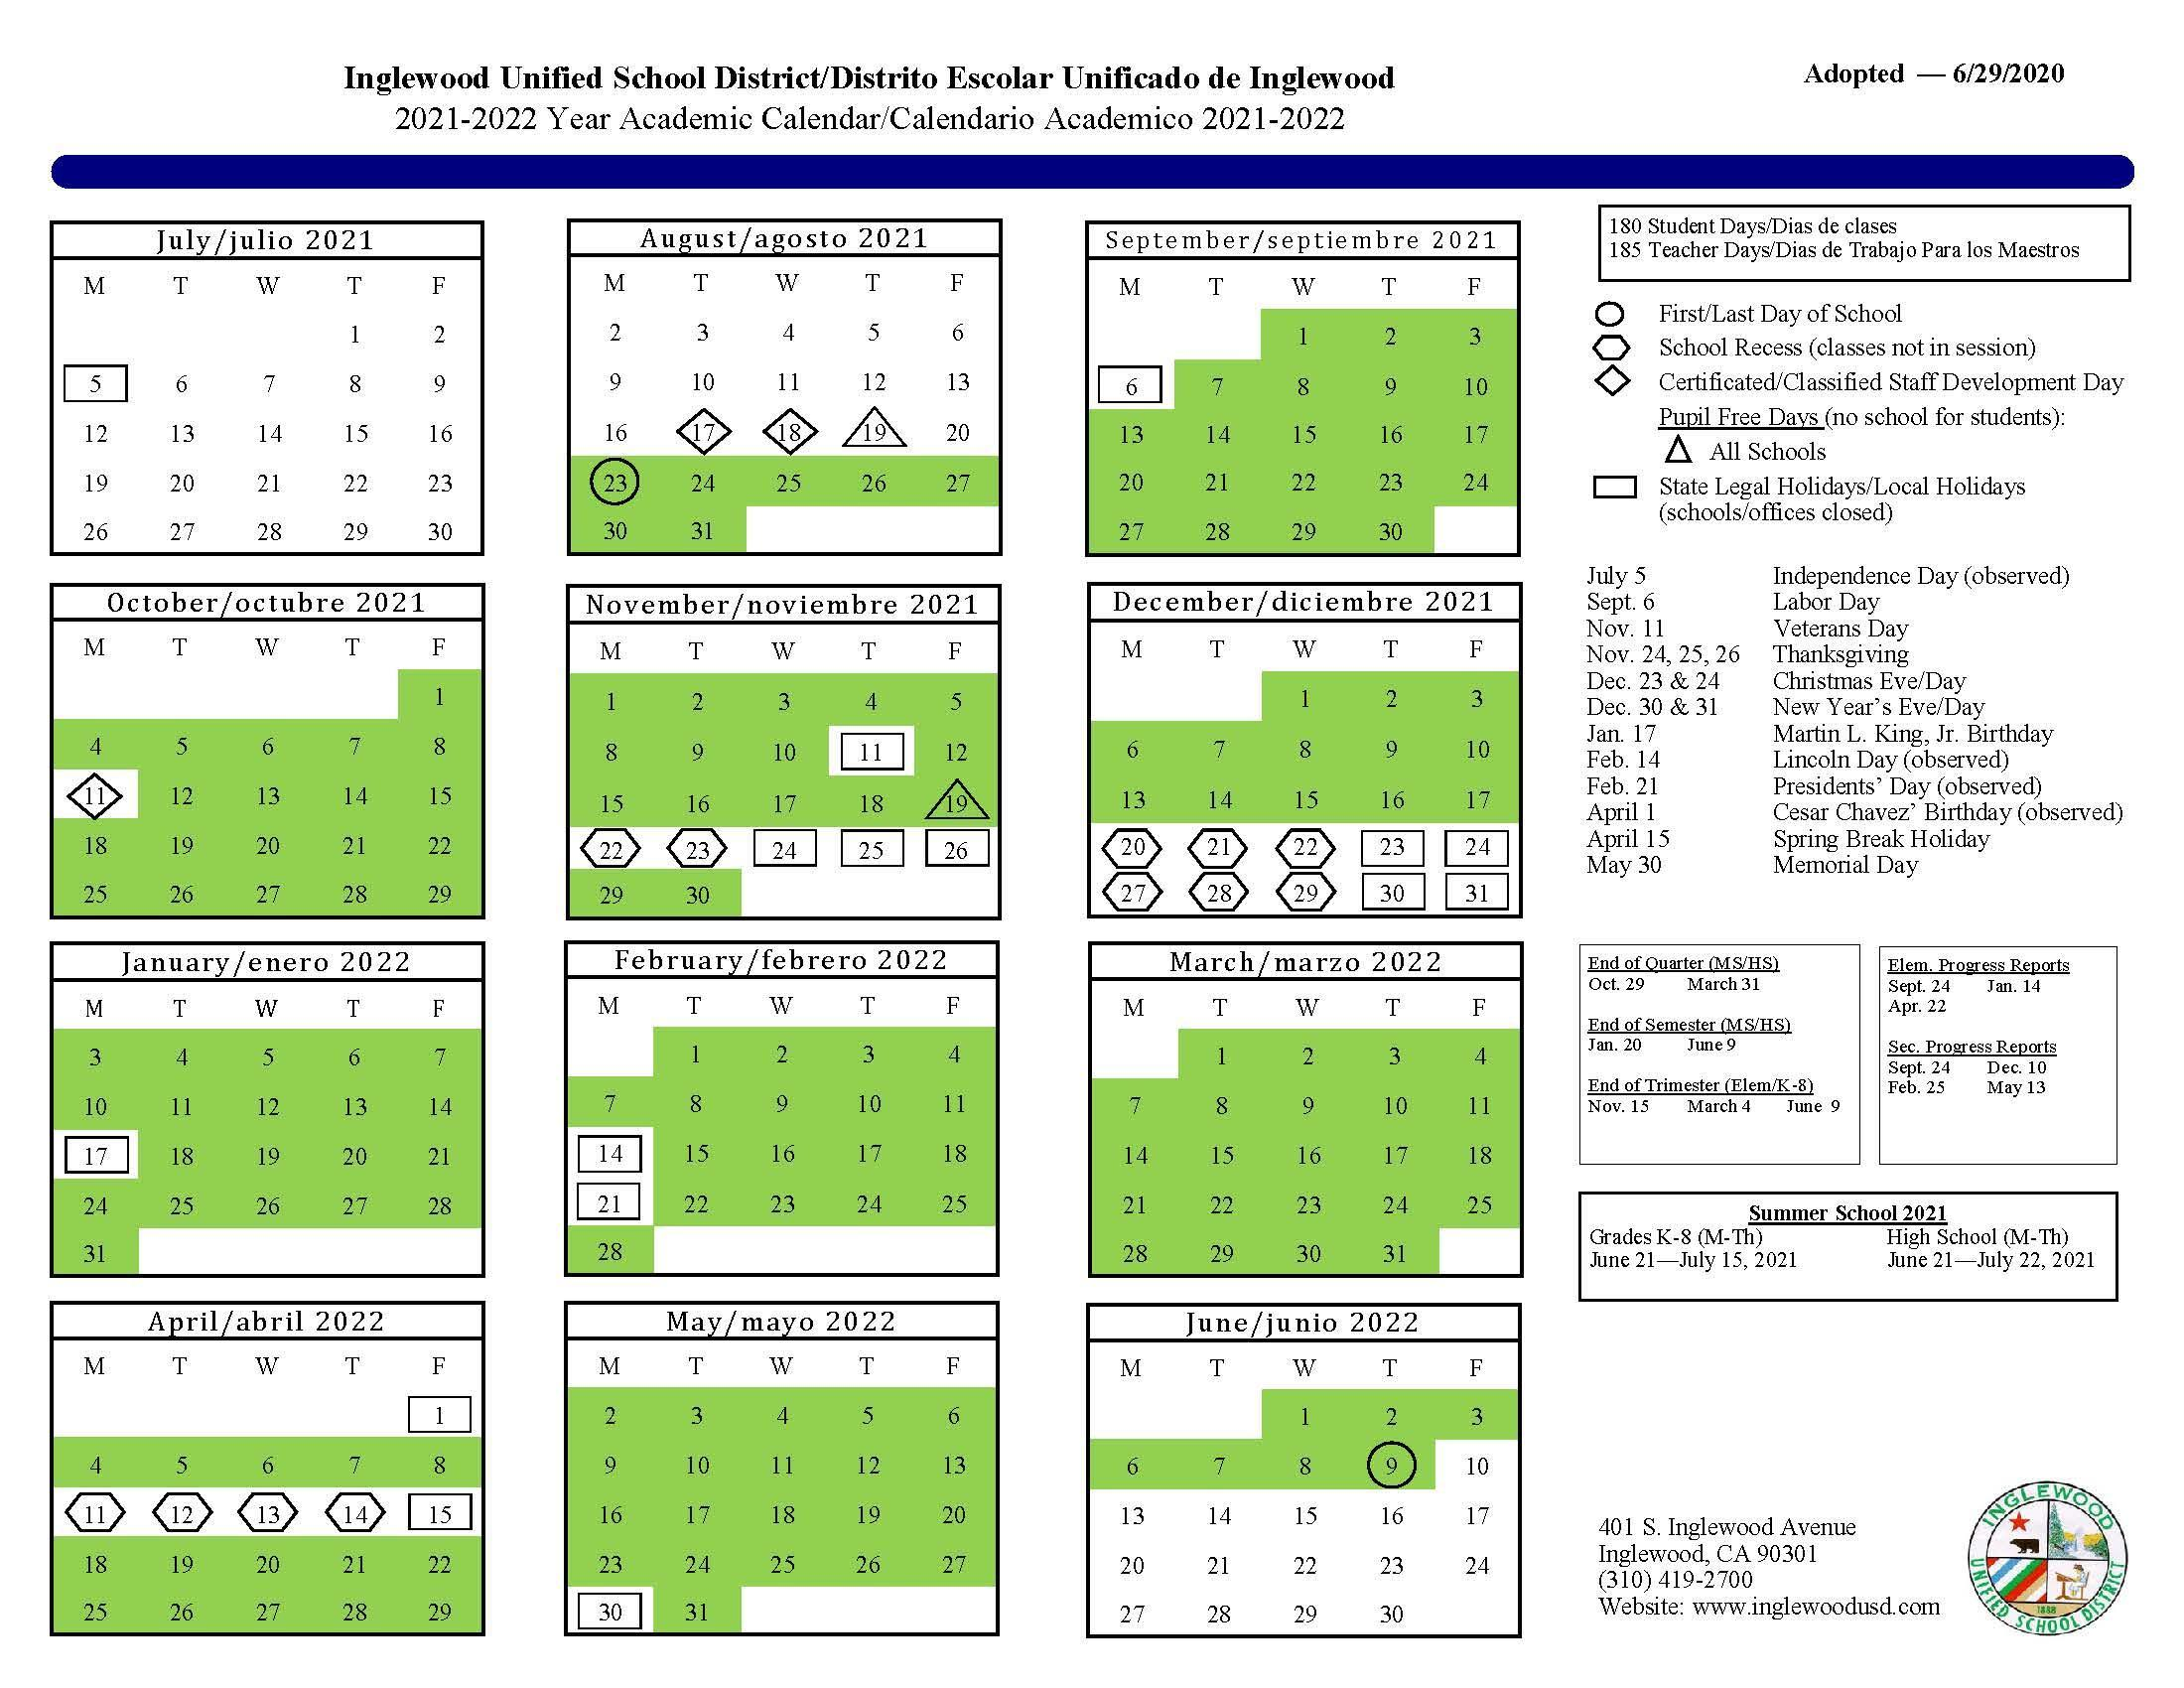 Lausd Calendar 2022.Calendar About Us Inglewood Unified School District